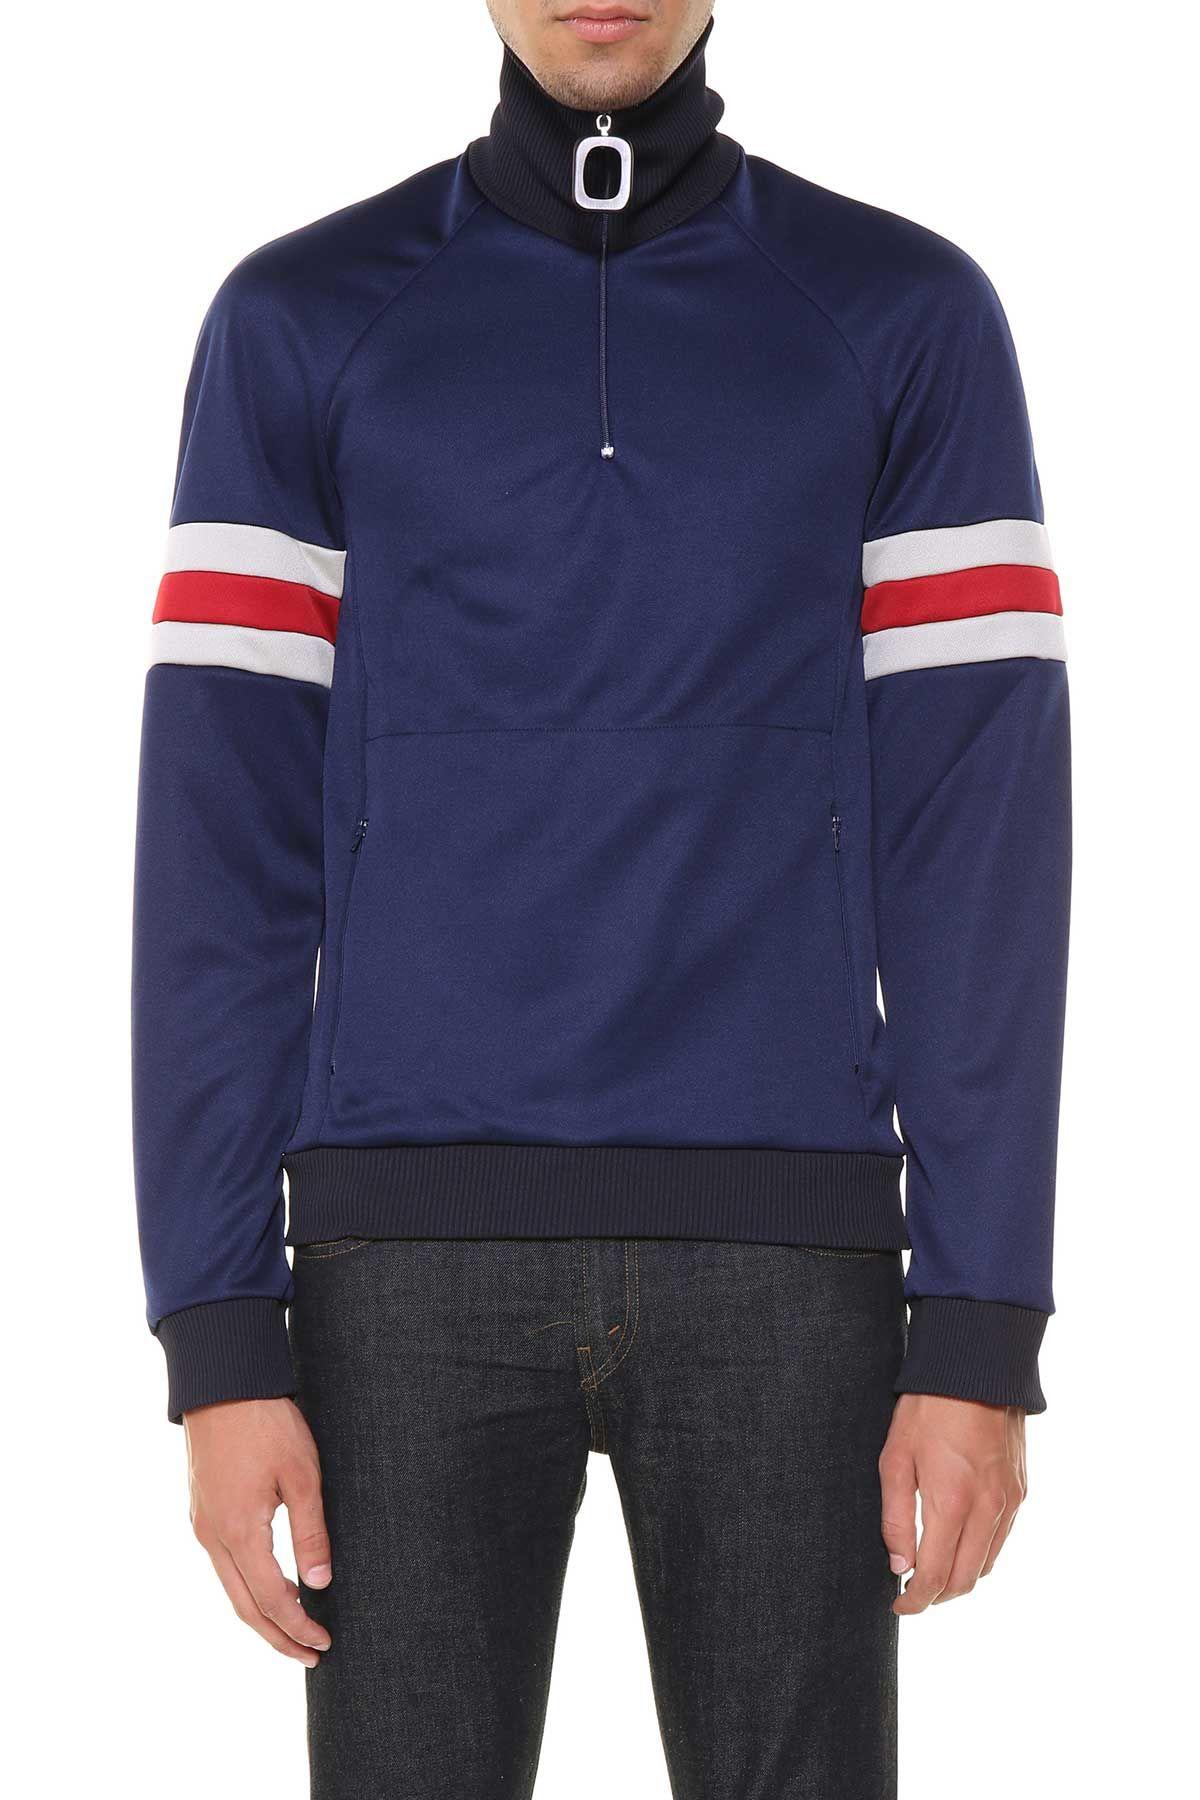 J.w. Anderson High Collar Sweatshirt